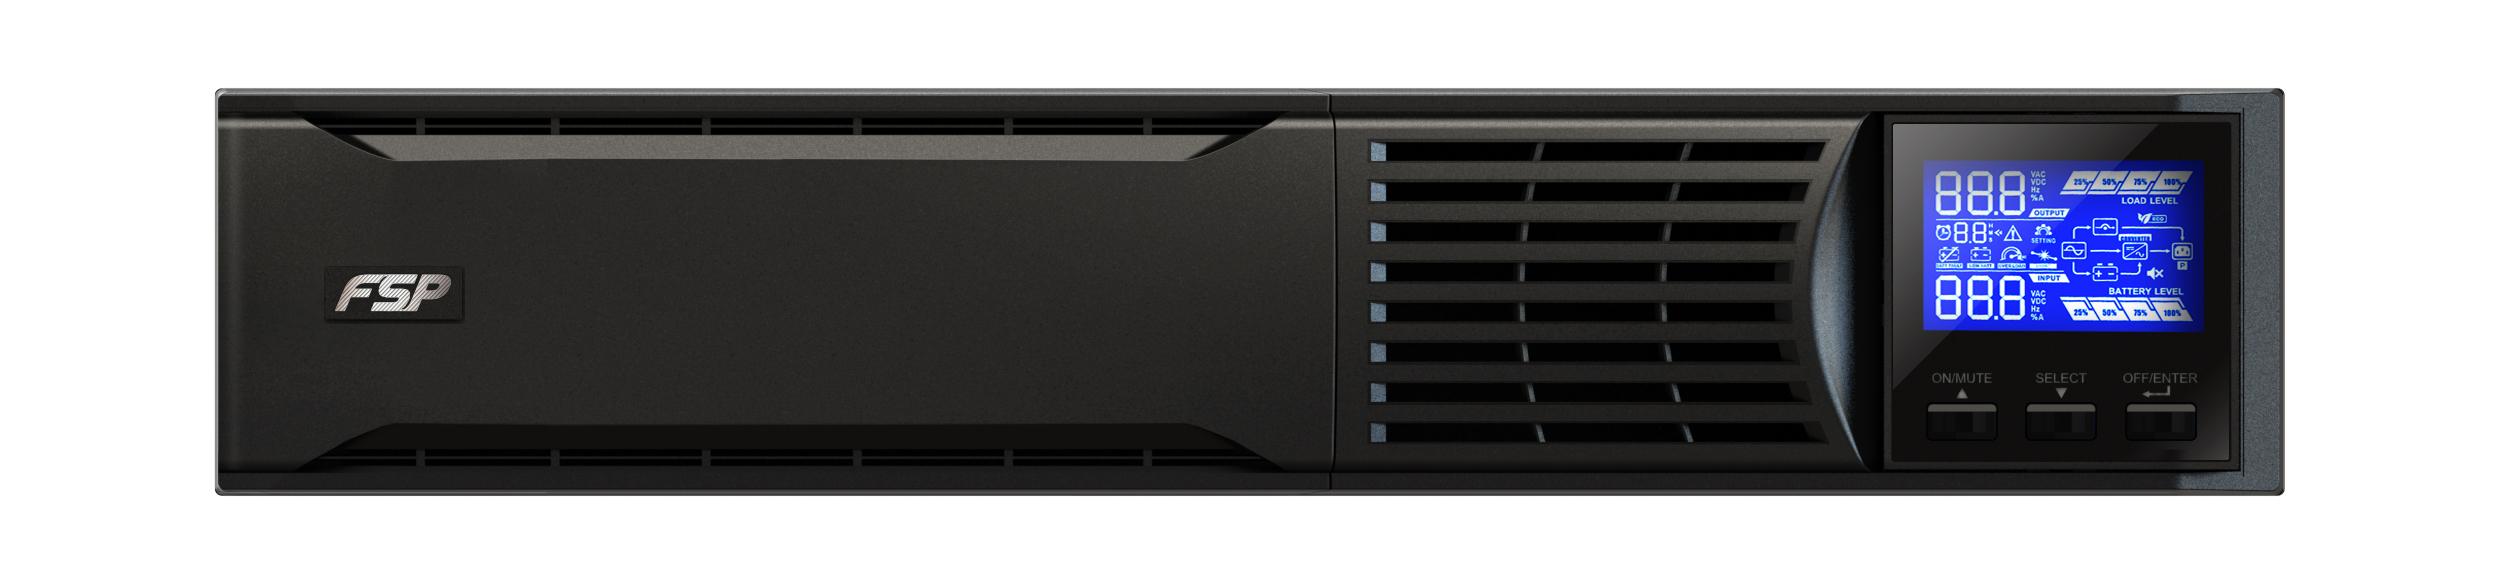 FSP/Fortron UPS CHAMP 1000 VA rack 2U, online